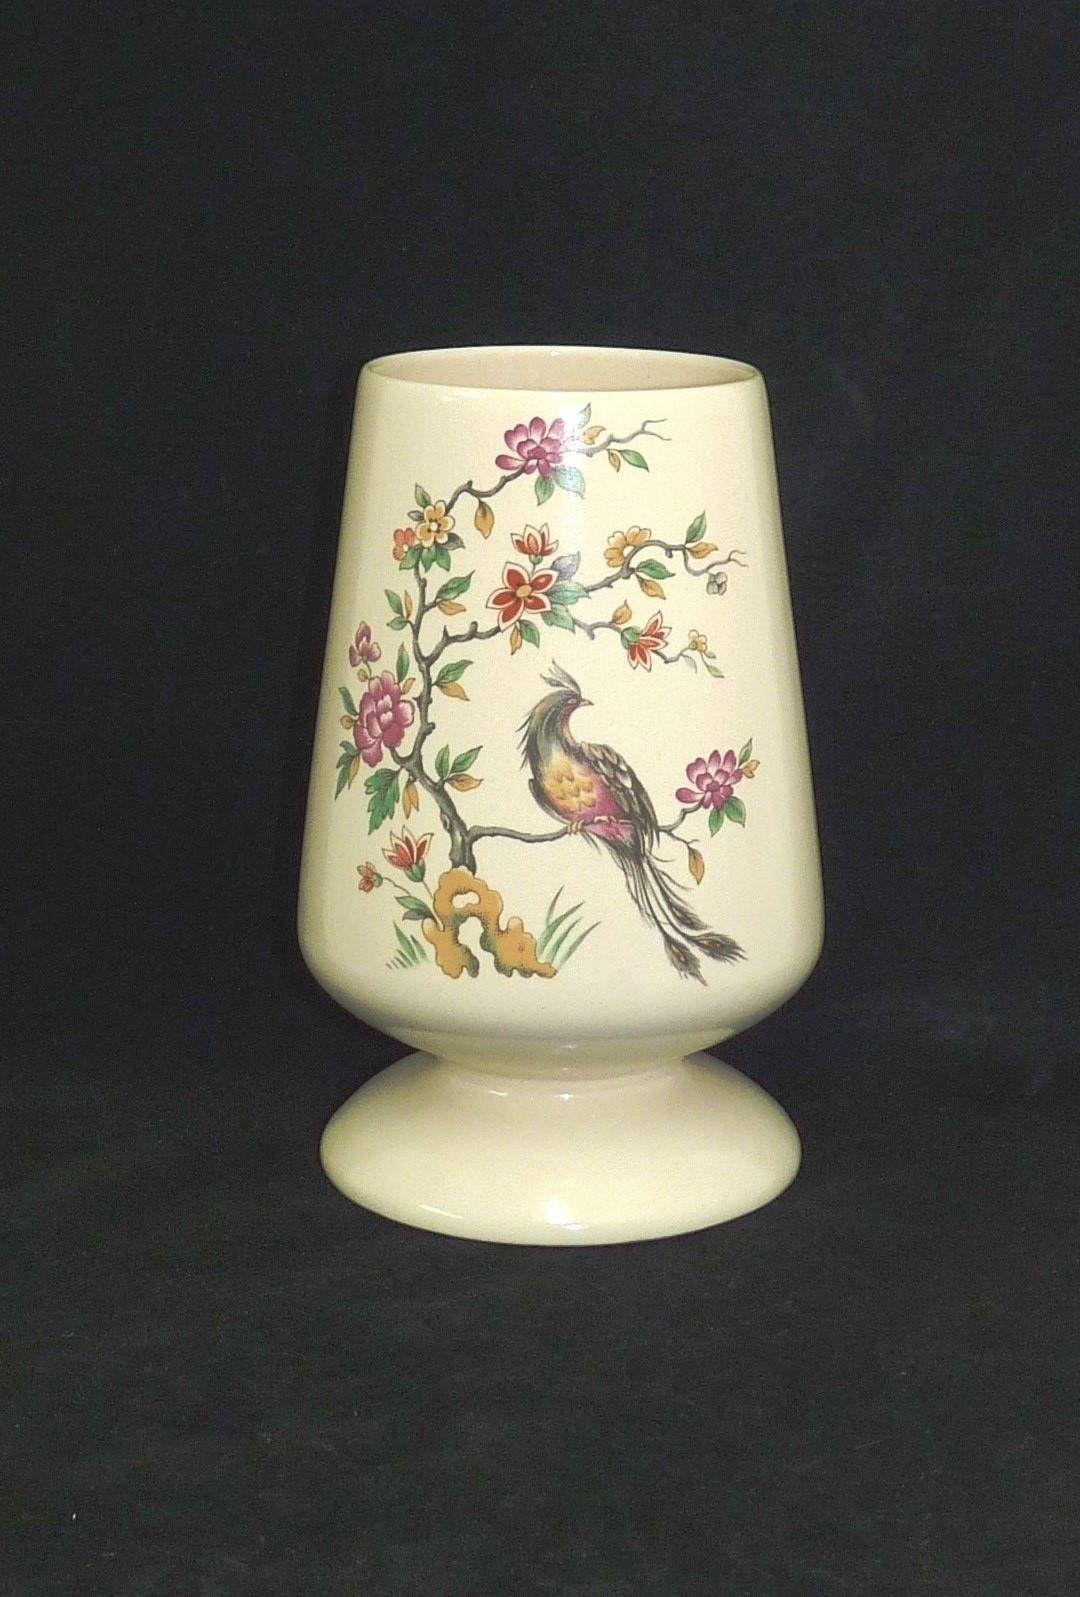 Cream ceramic vase new devon pottery cream pottery vase floral cream ceramic vase new devon pottery cream pottery vase floral phoenix design oriental design vase flower arrangement arranging reviewsmspy